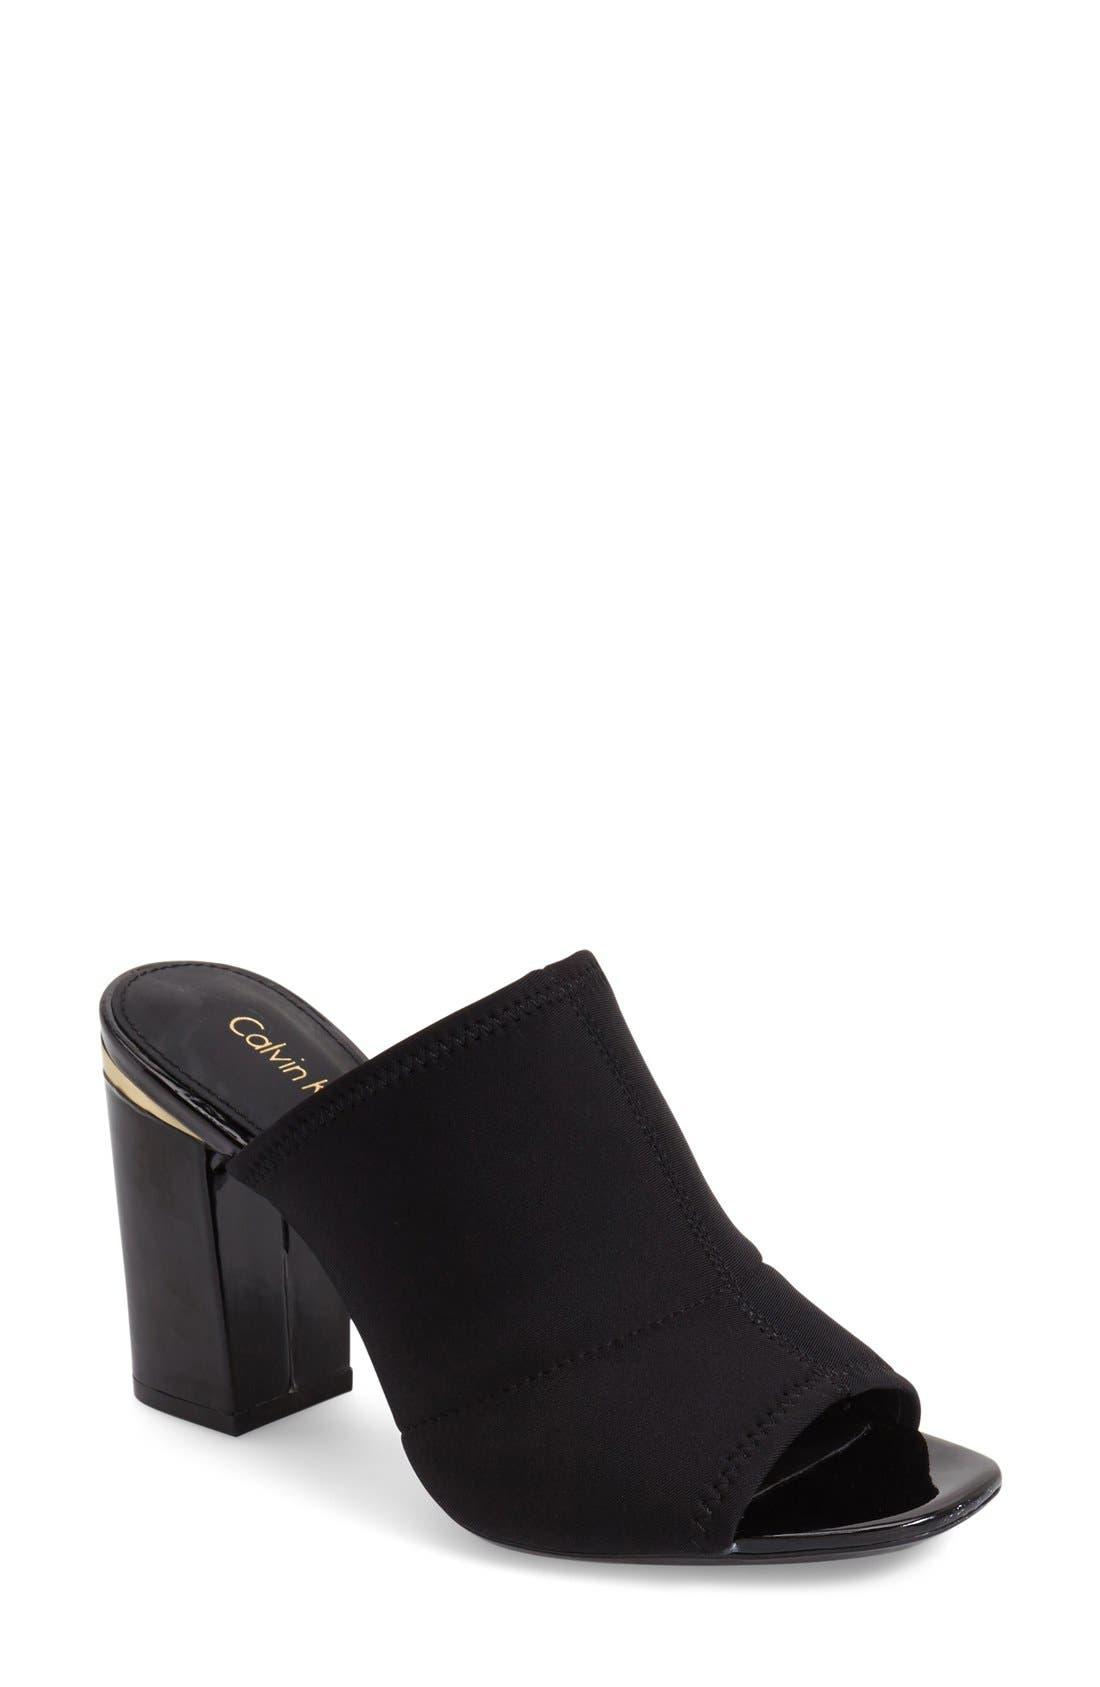 Main Image - Calvin Klein 'Cice' Mule Sandal (Women)